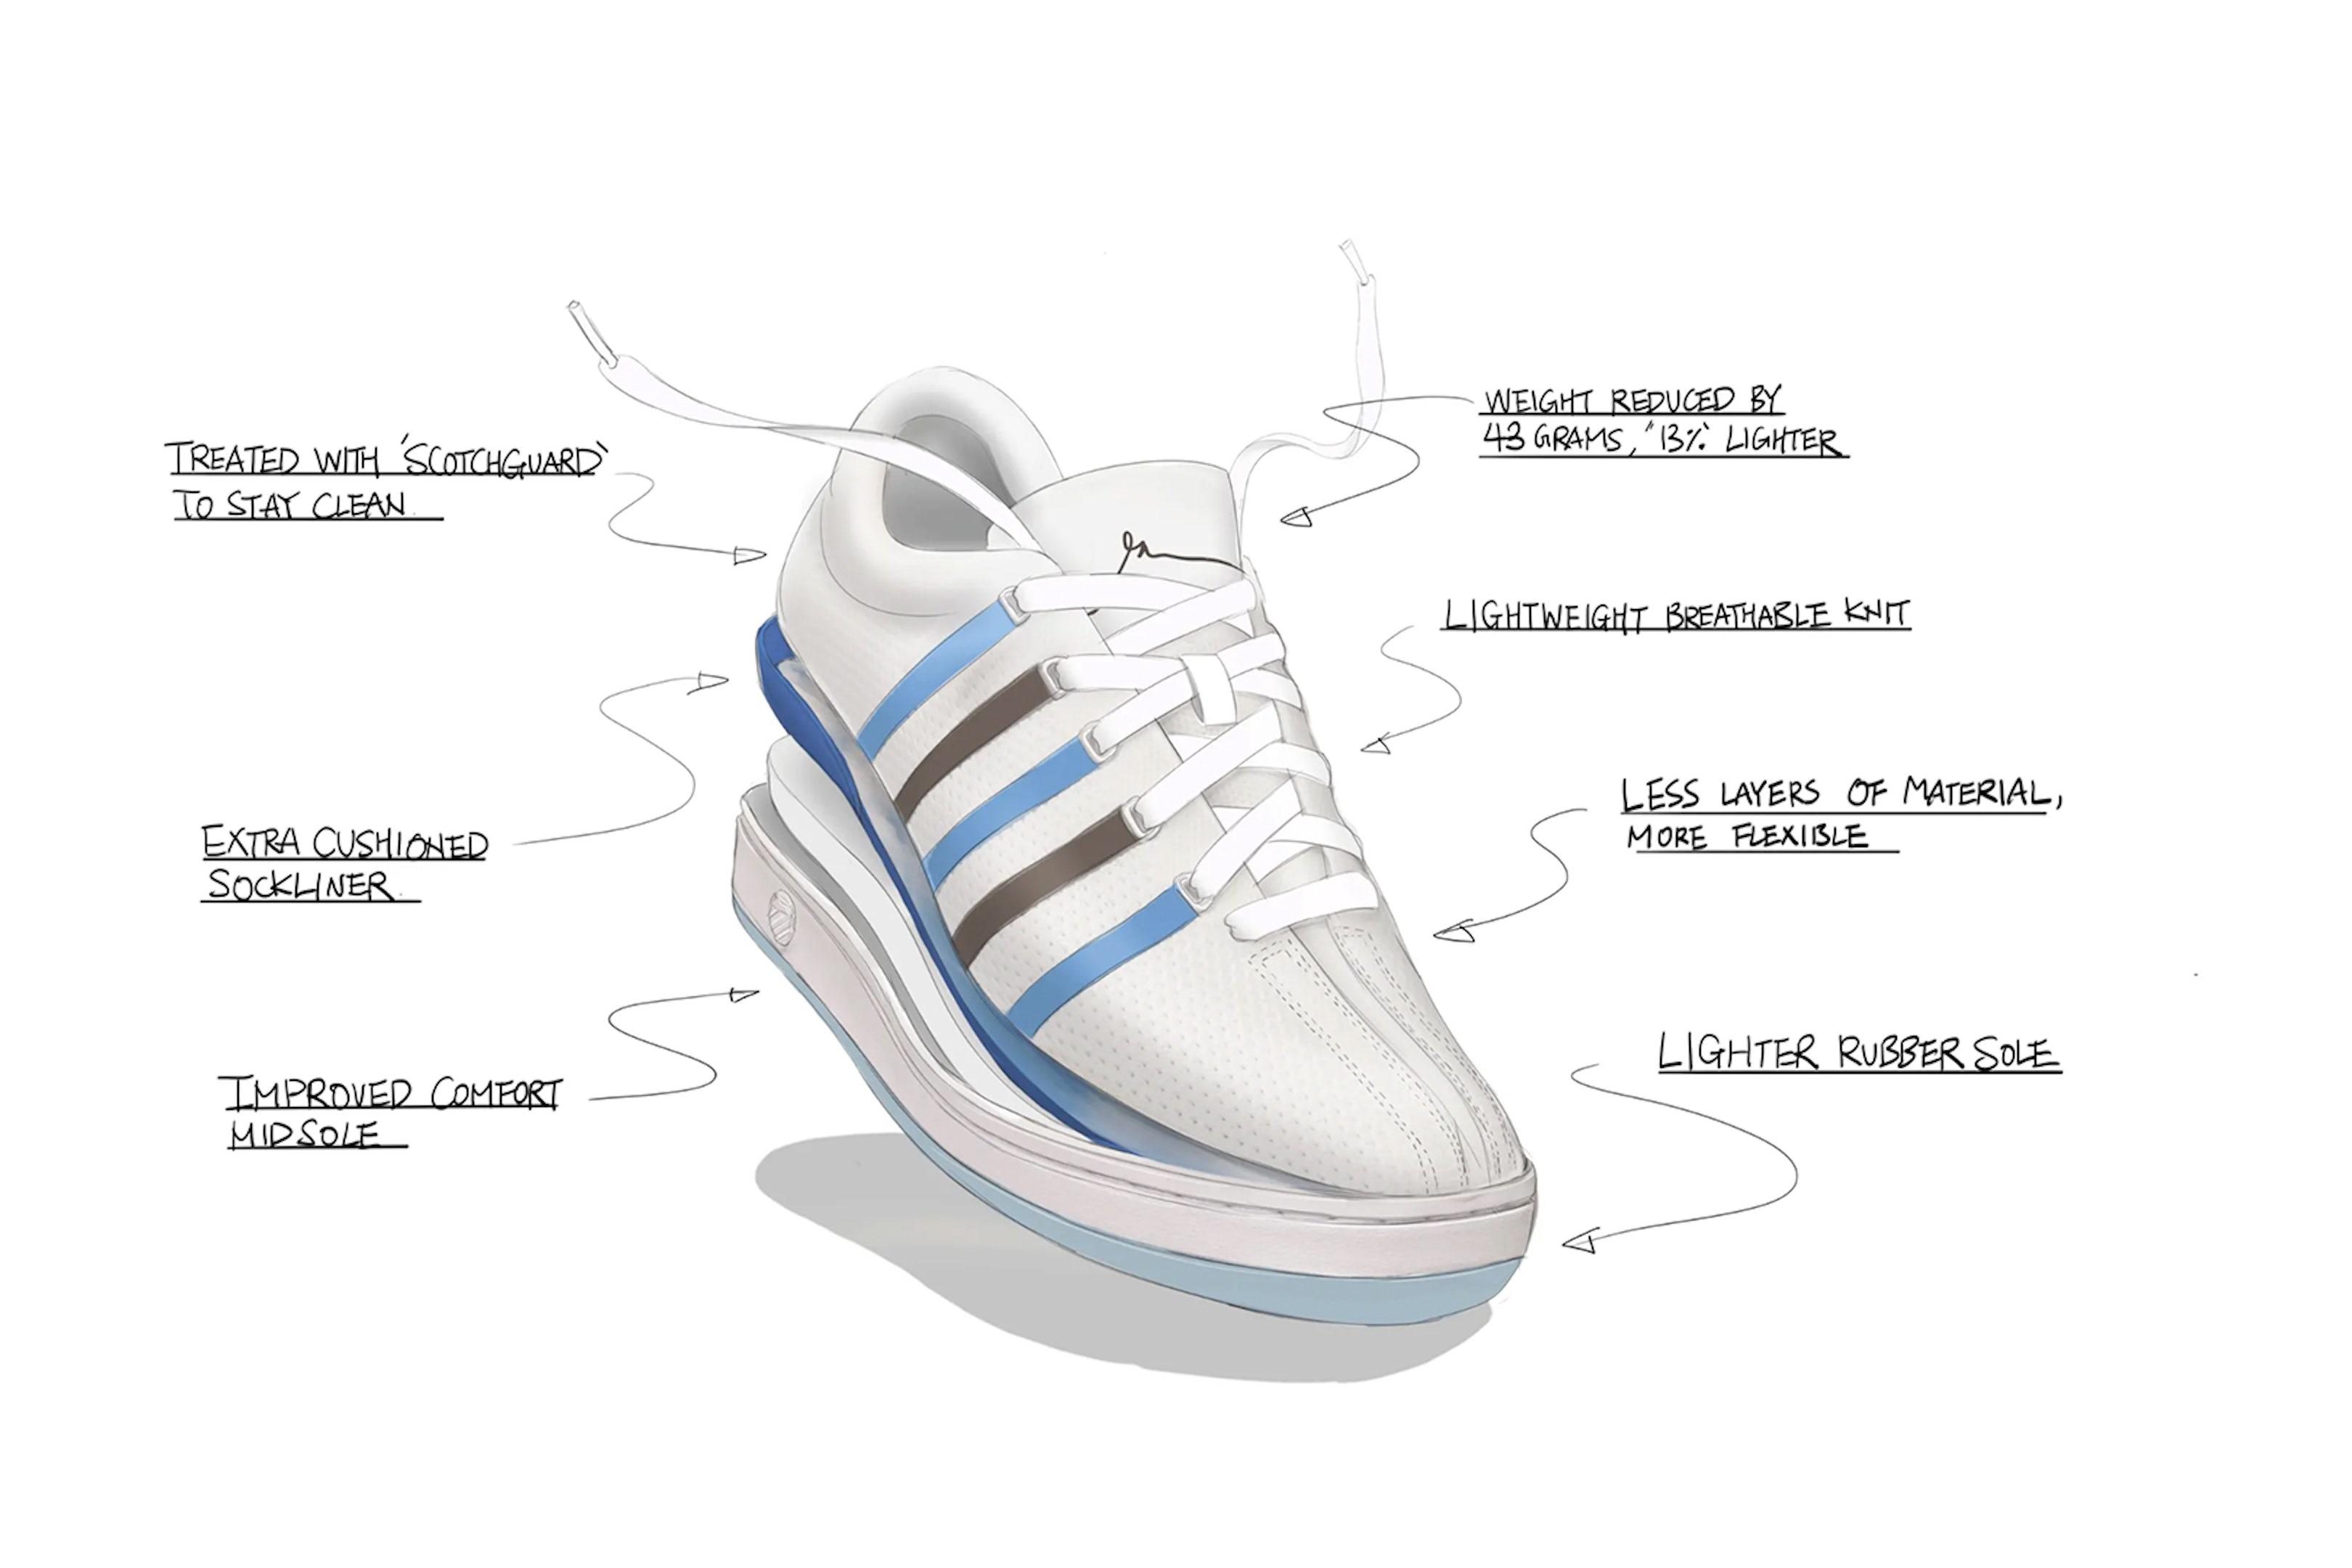 kswiss sketch sneaker